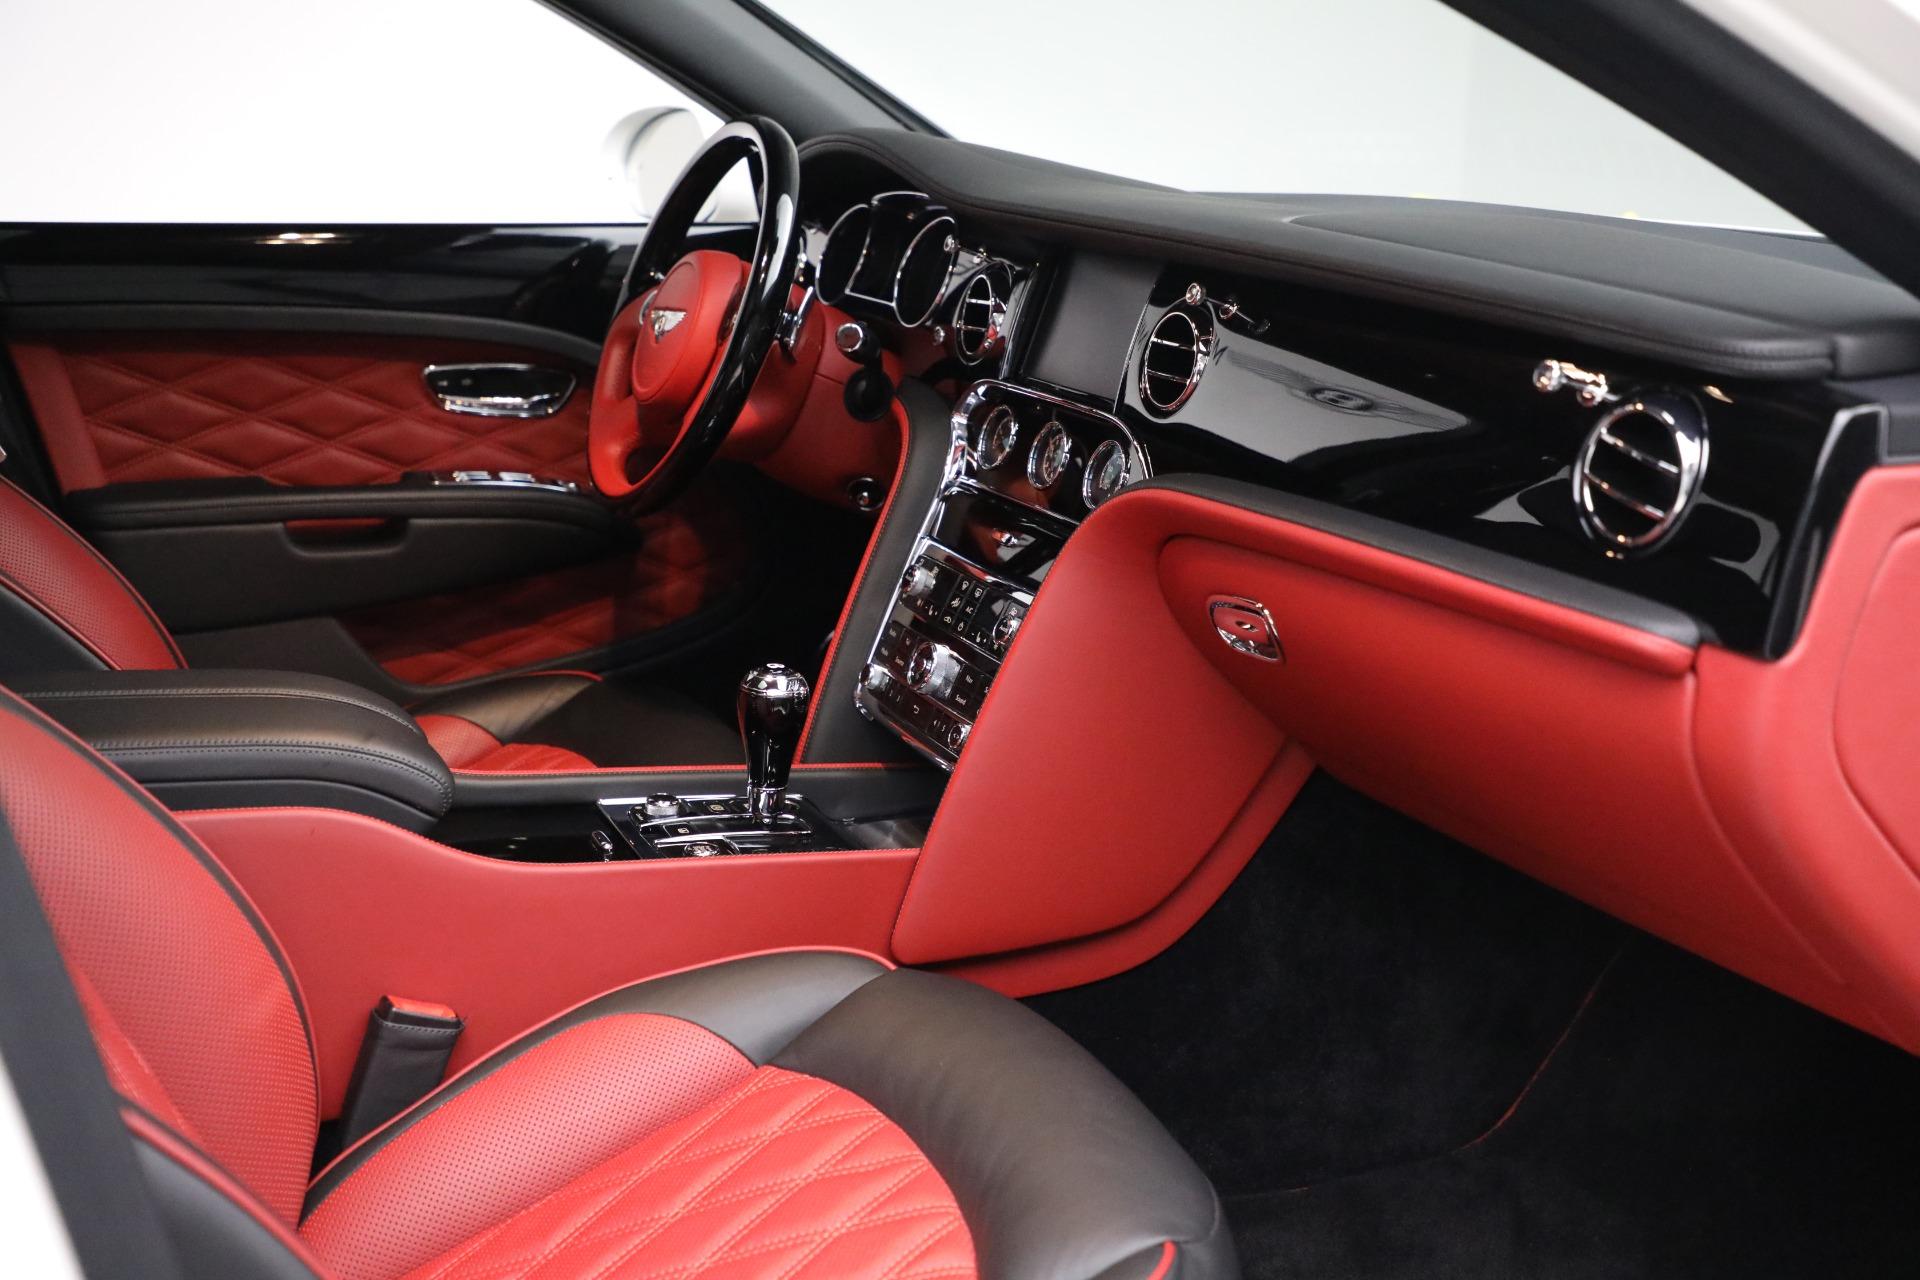 Used 2018 Bentley Mulsanne Speed For Sale In Westport, CT 2075_p27